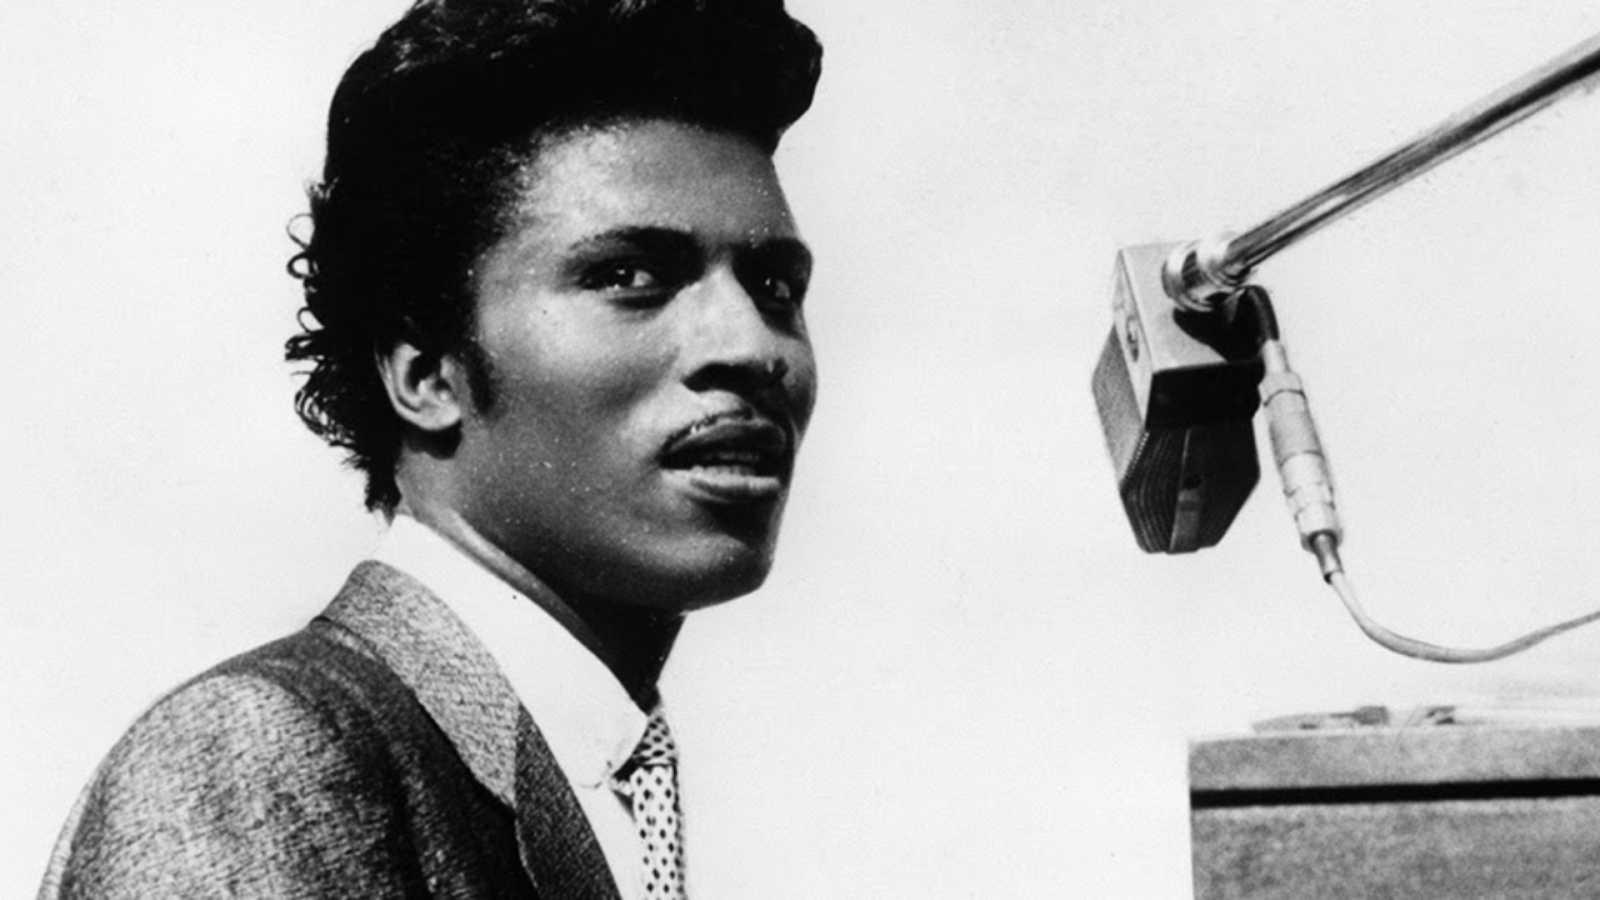 El sótano - Inmortal Little Richard - 11/05/20 - escuchar ahora